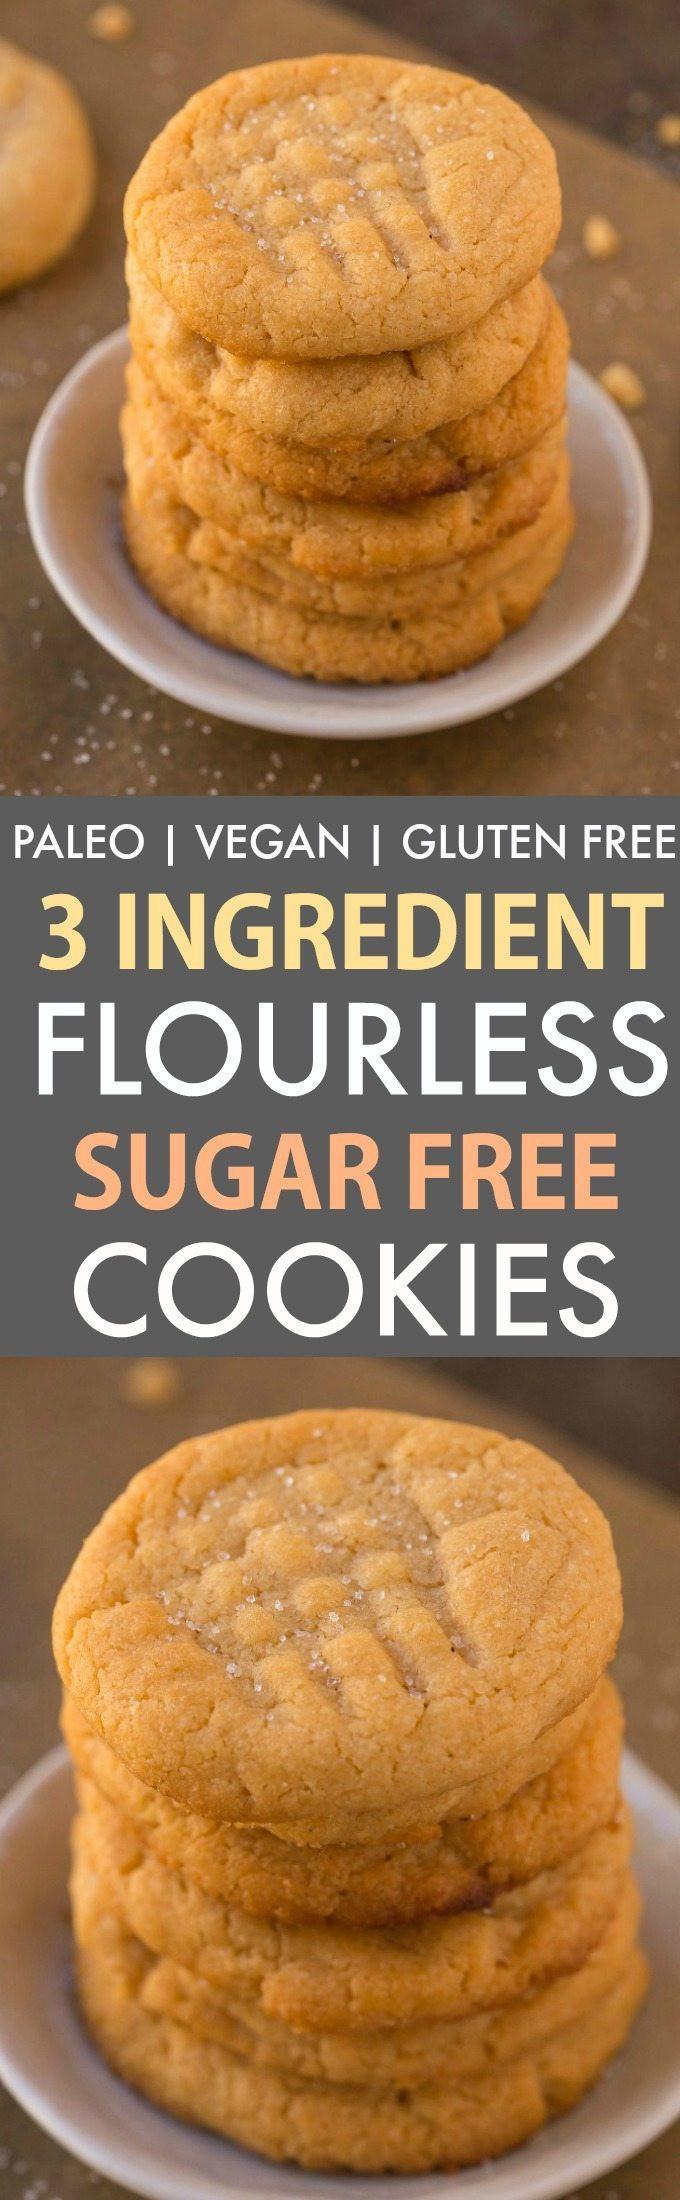 Gluten Free Dairy Free Sugar Free Cookies  3 Ingre nt Sugar Free Flourless Cookies Paleo Vegan